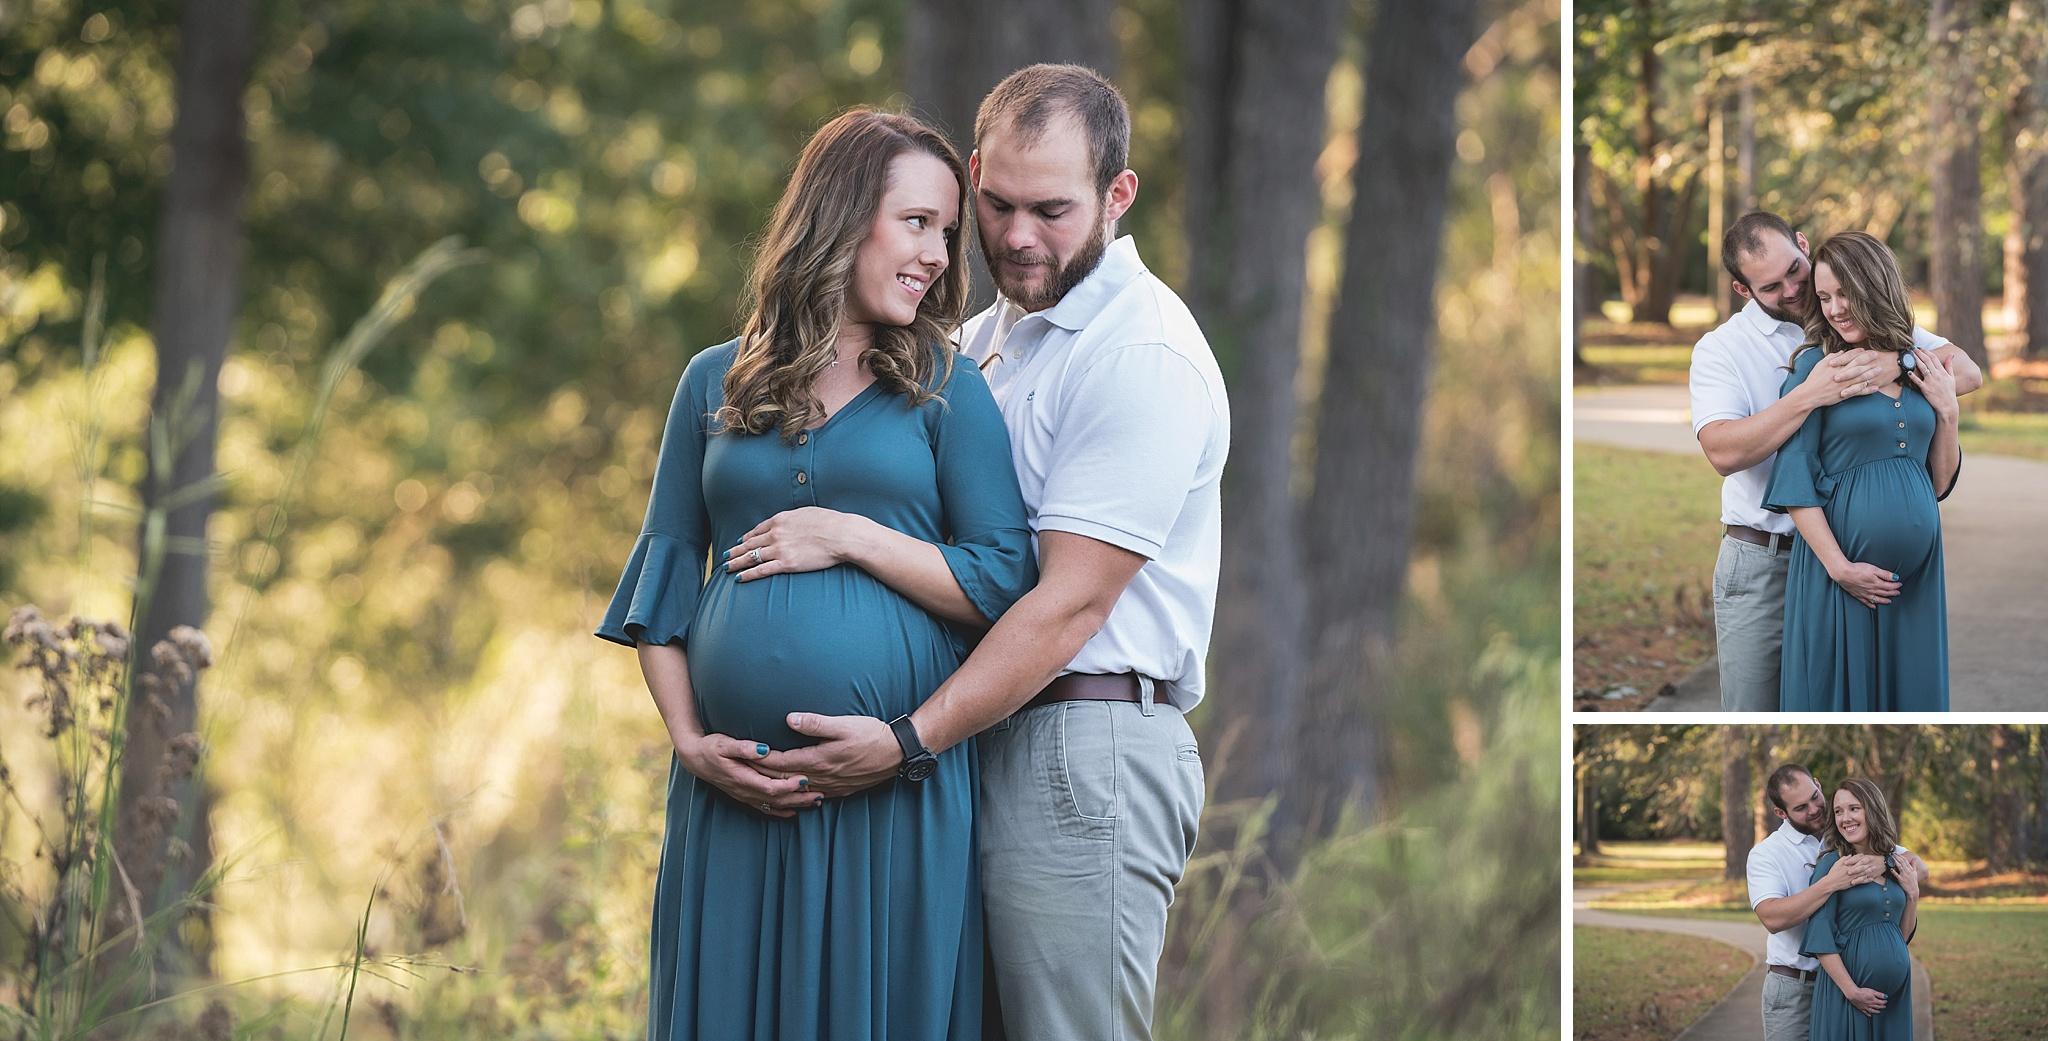 Farmville-NC-Maternity-Photographer-065.jpg